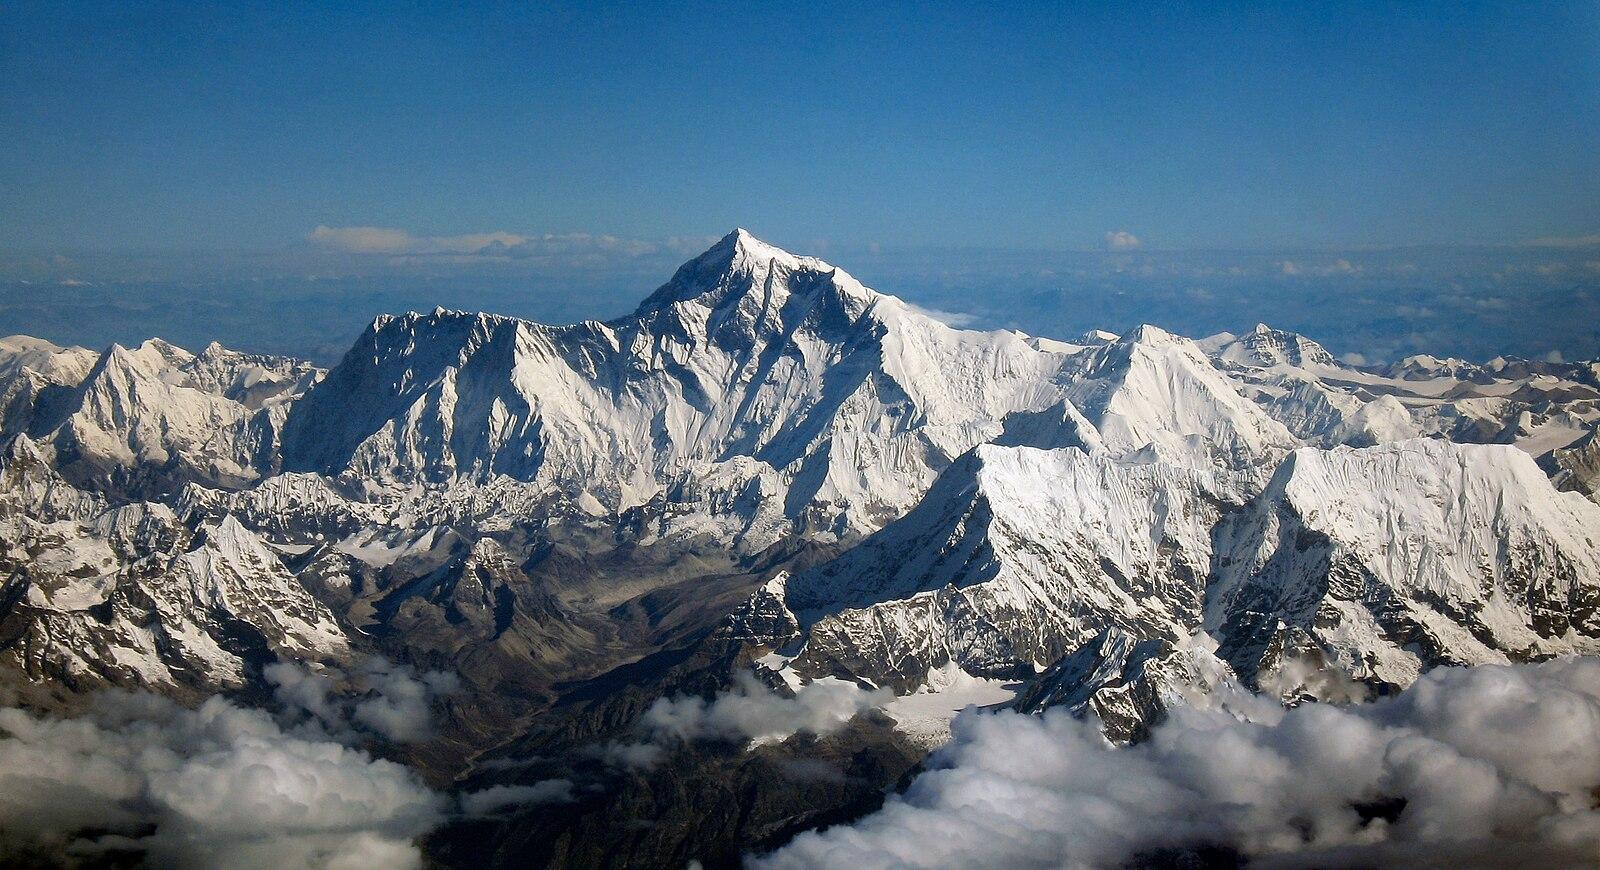 1600px Mount Everest as seen from Drukair2 PLW edit